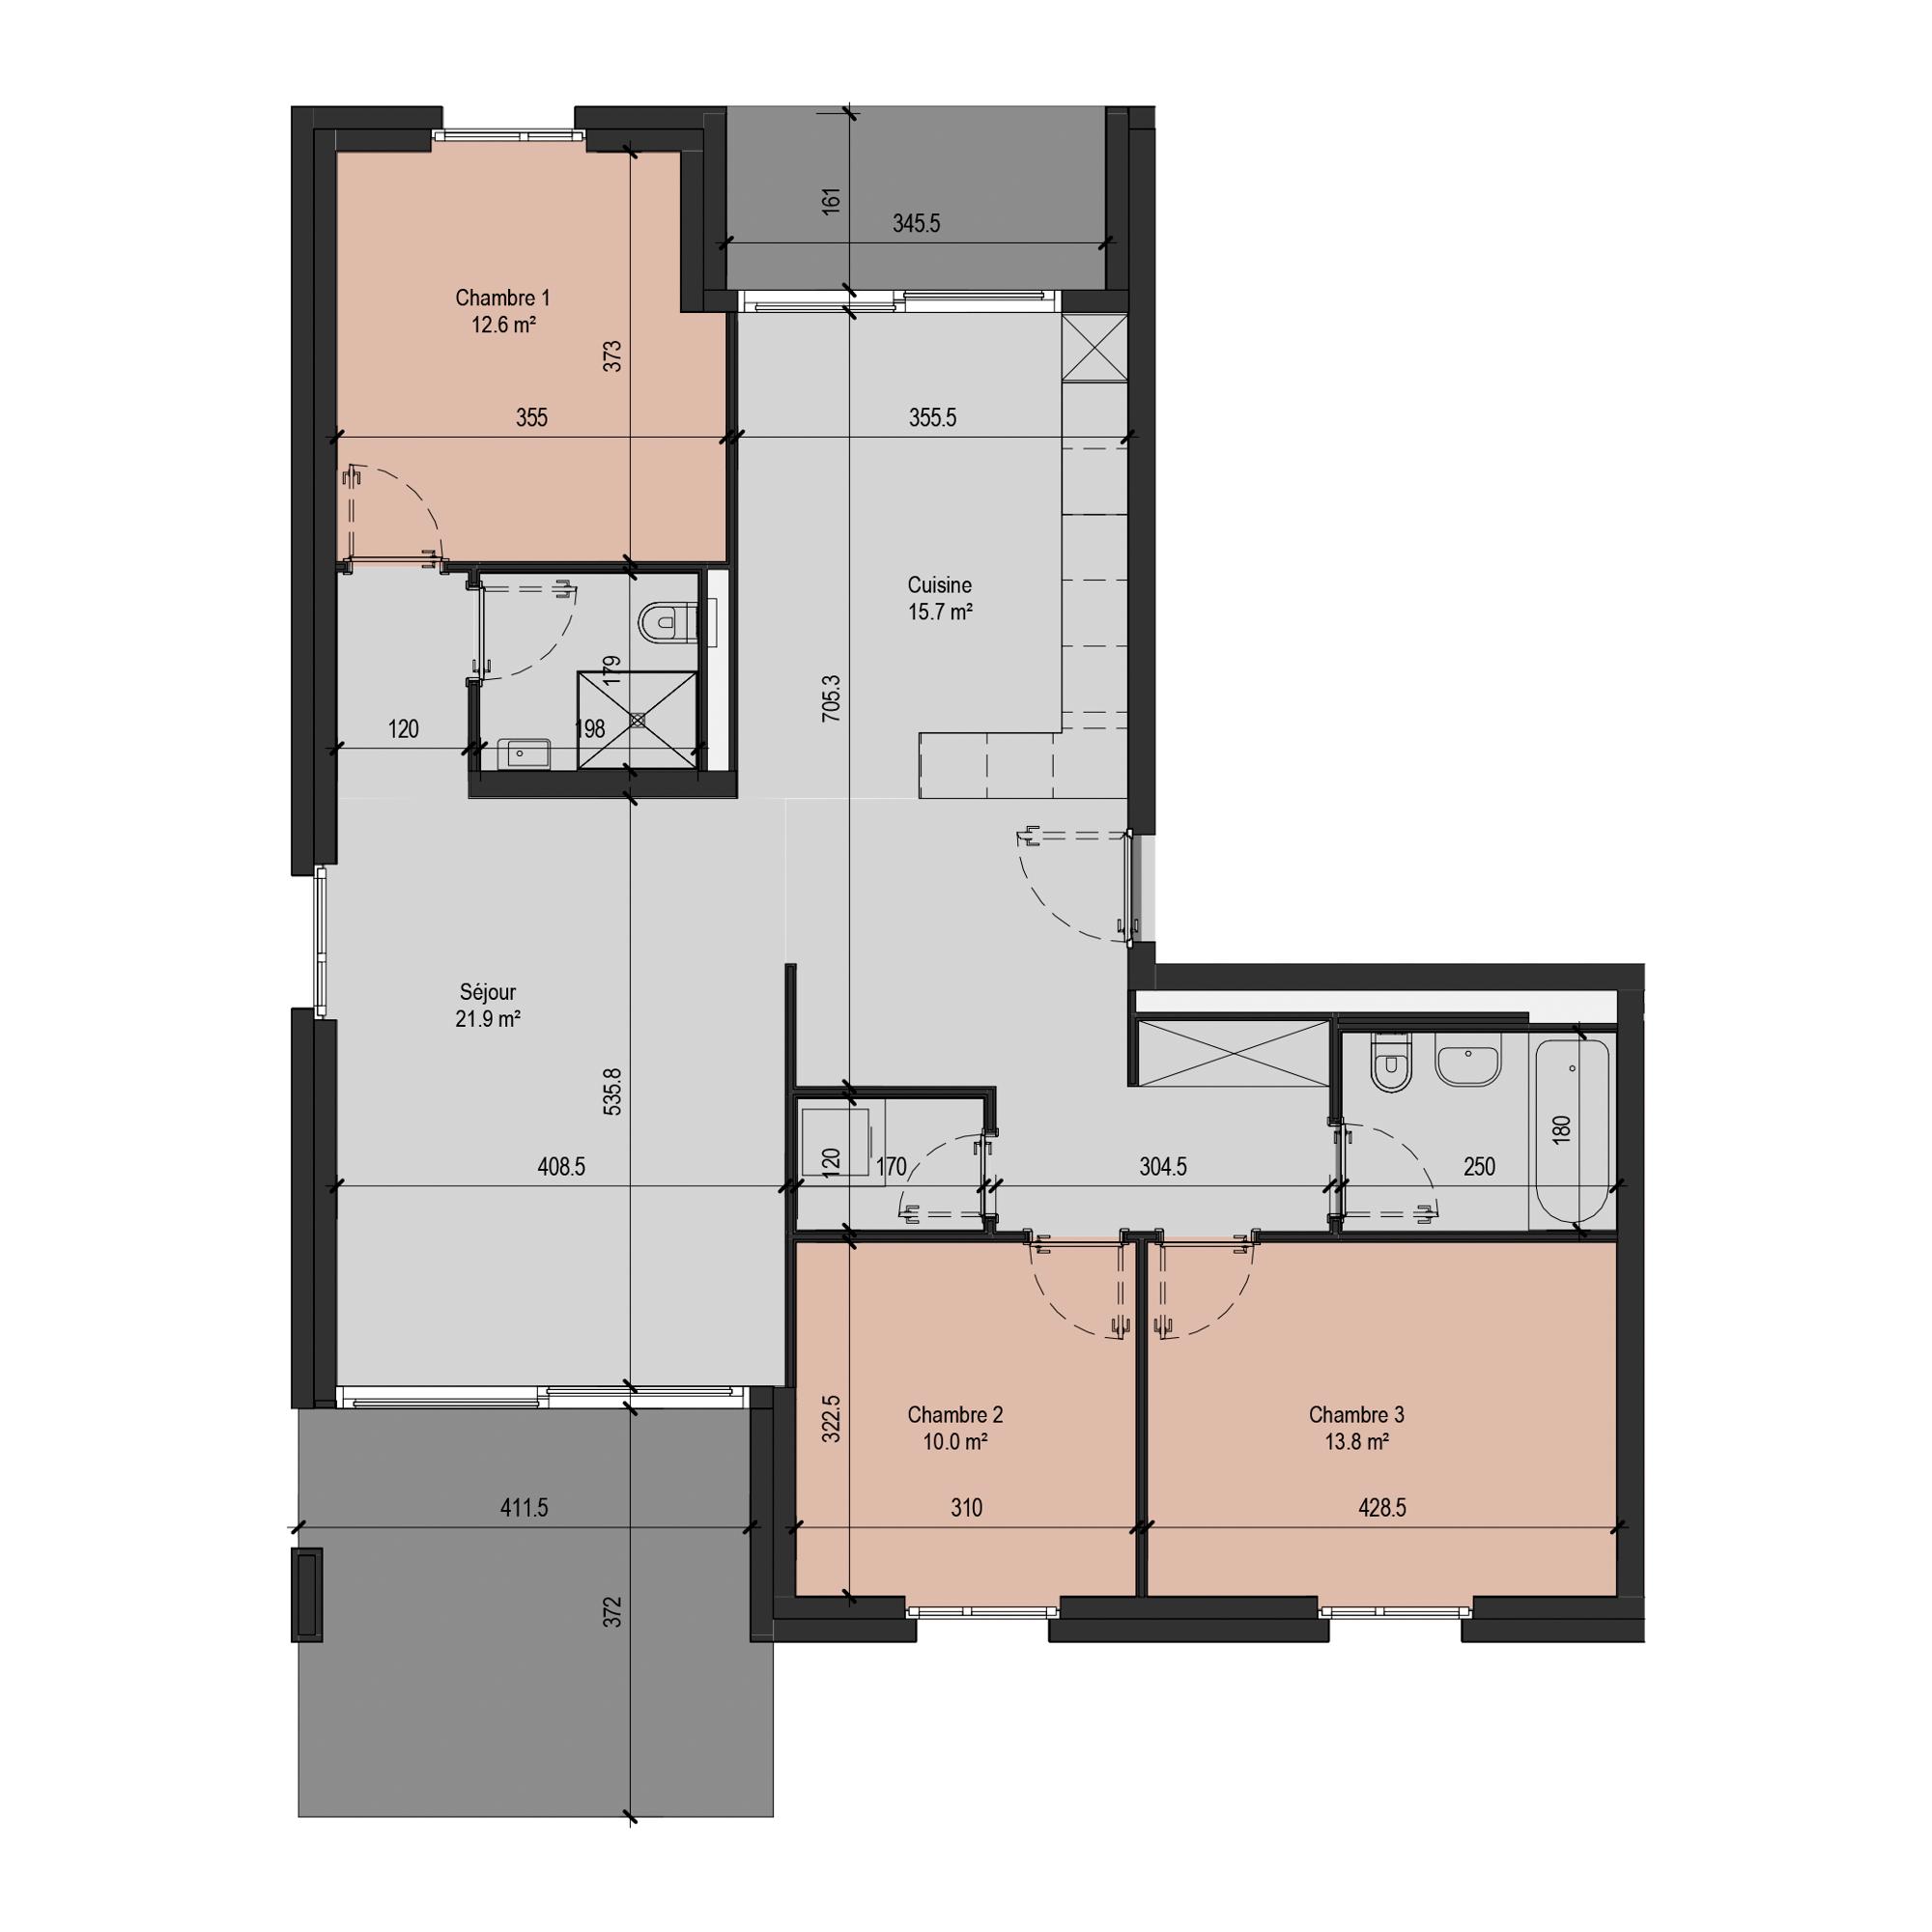 Lot 31